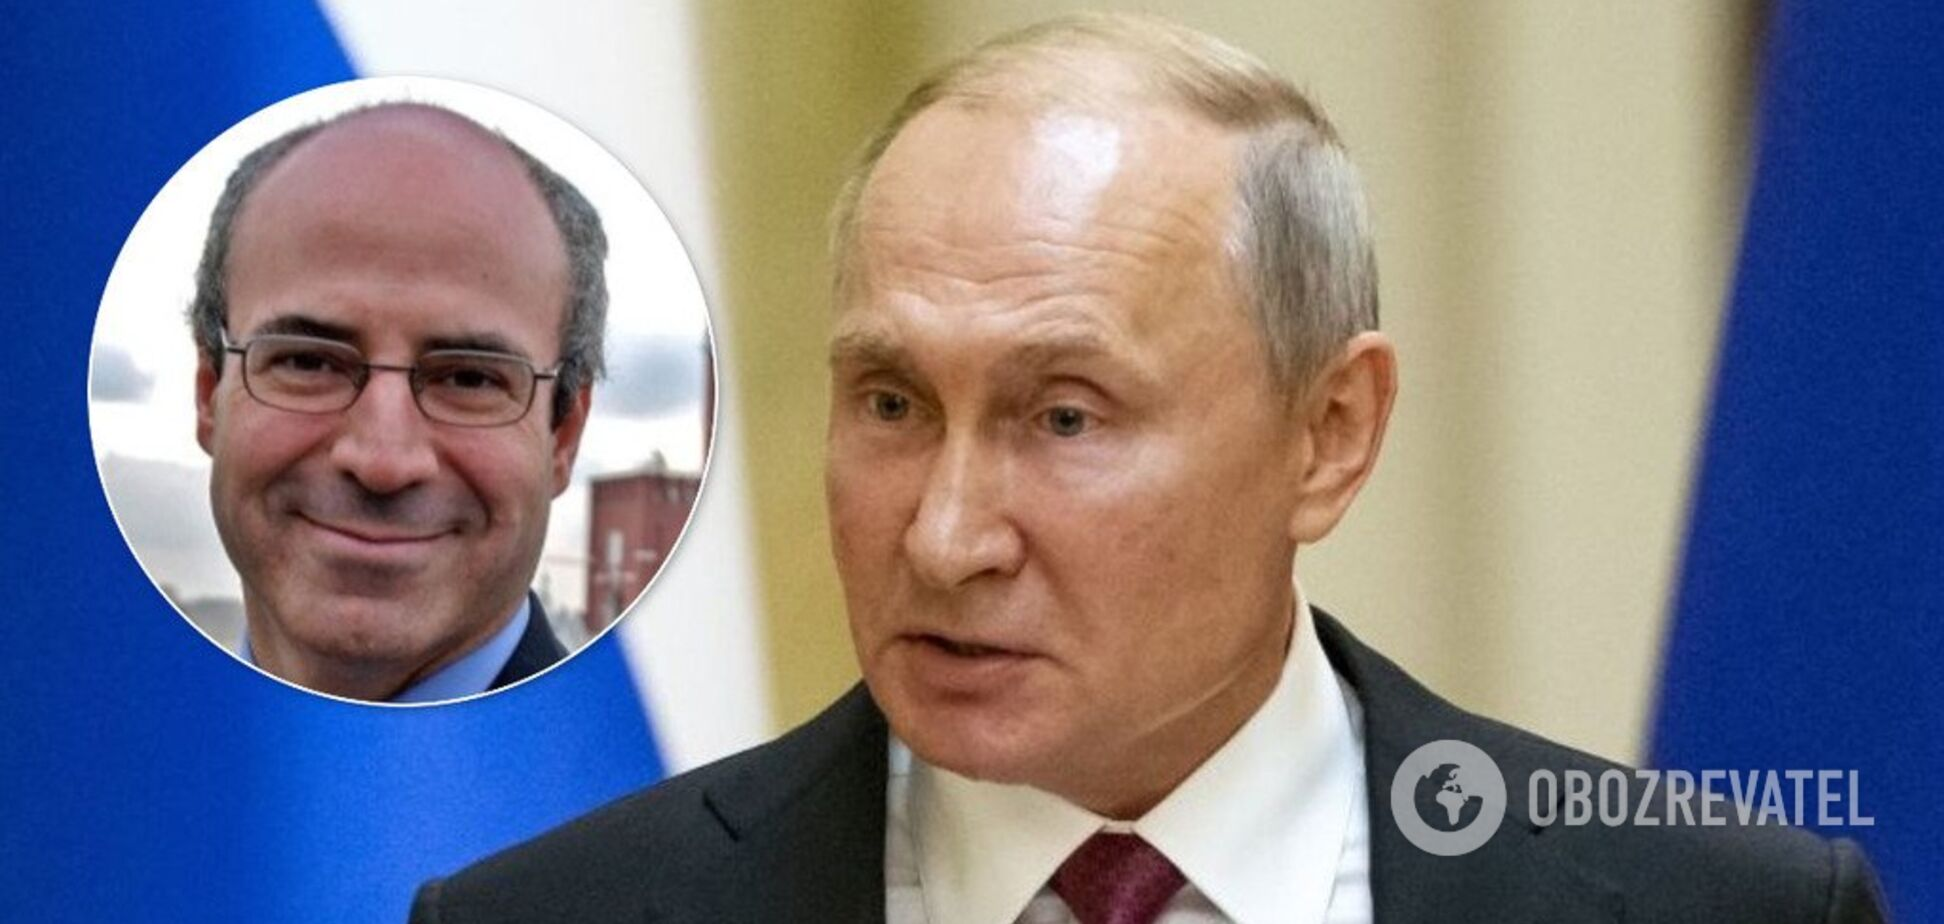 Представились сантехниками: в Давосе сорвали покушение на 'личного врага Путина'